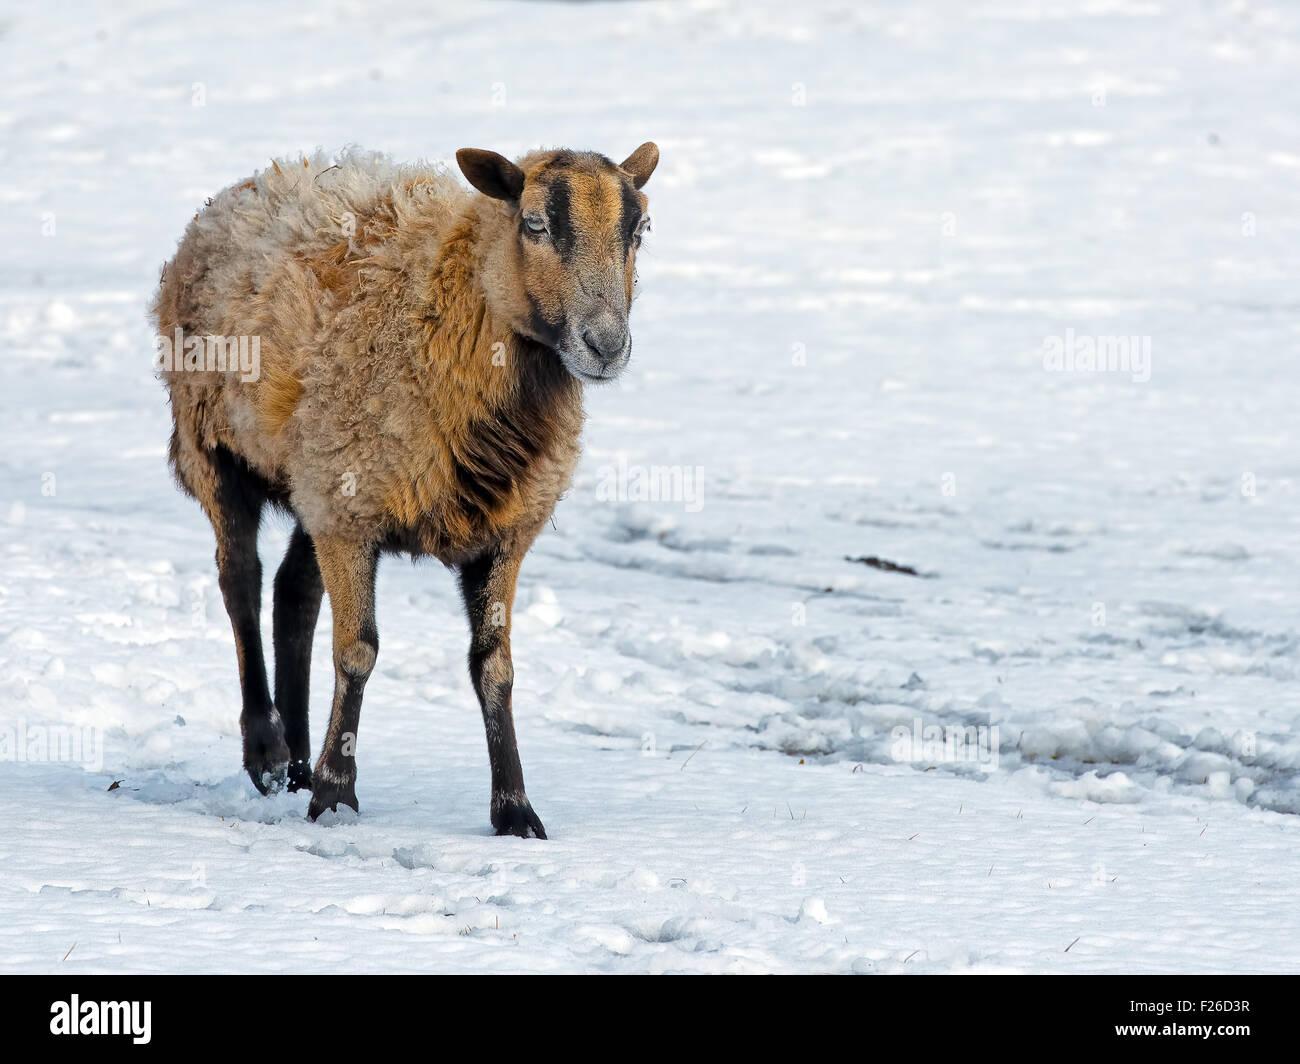 Oveja oveja caminar en la nieve Imagen De Stock